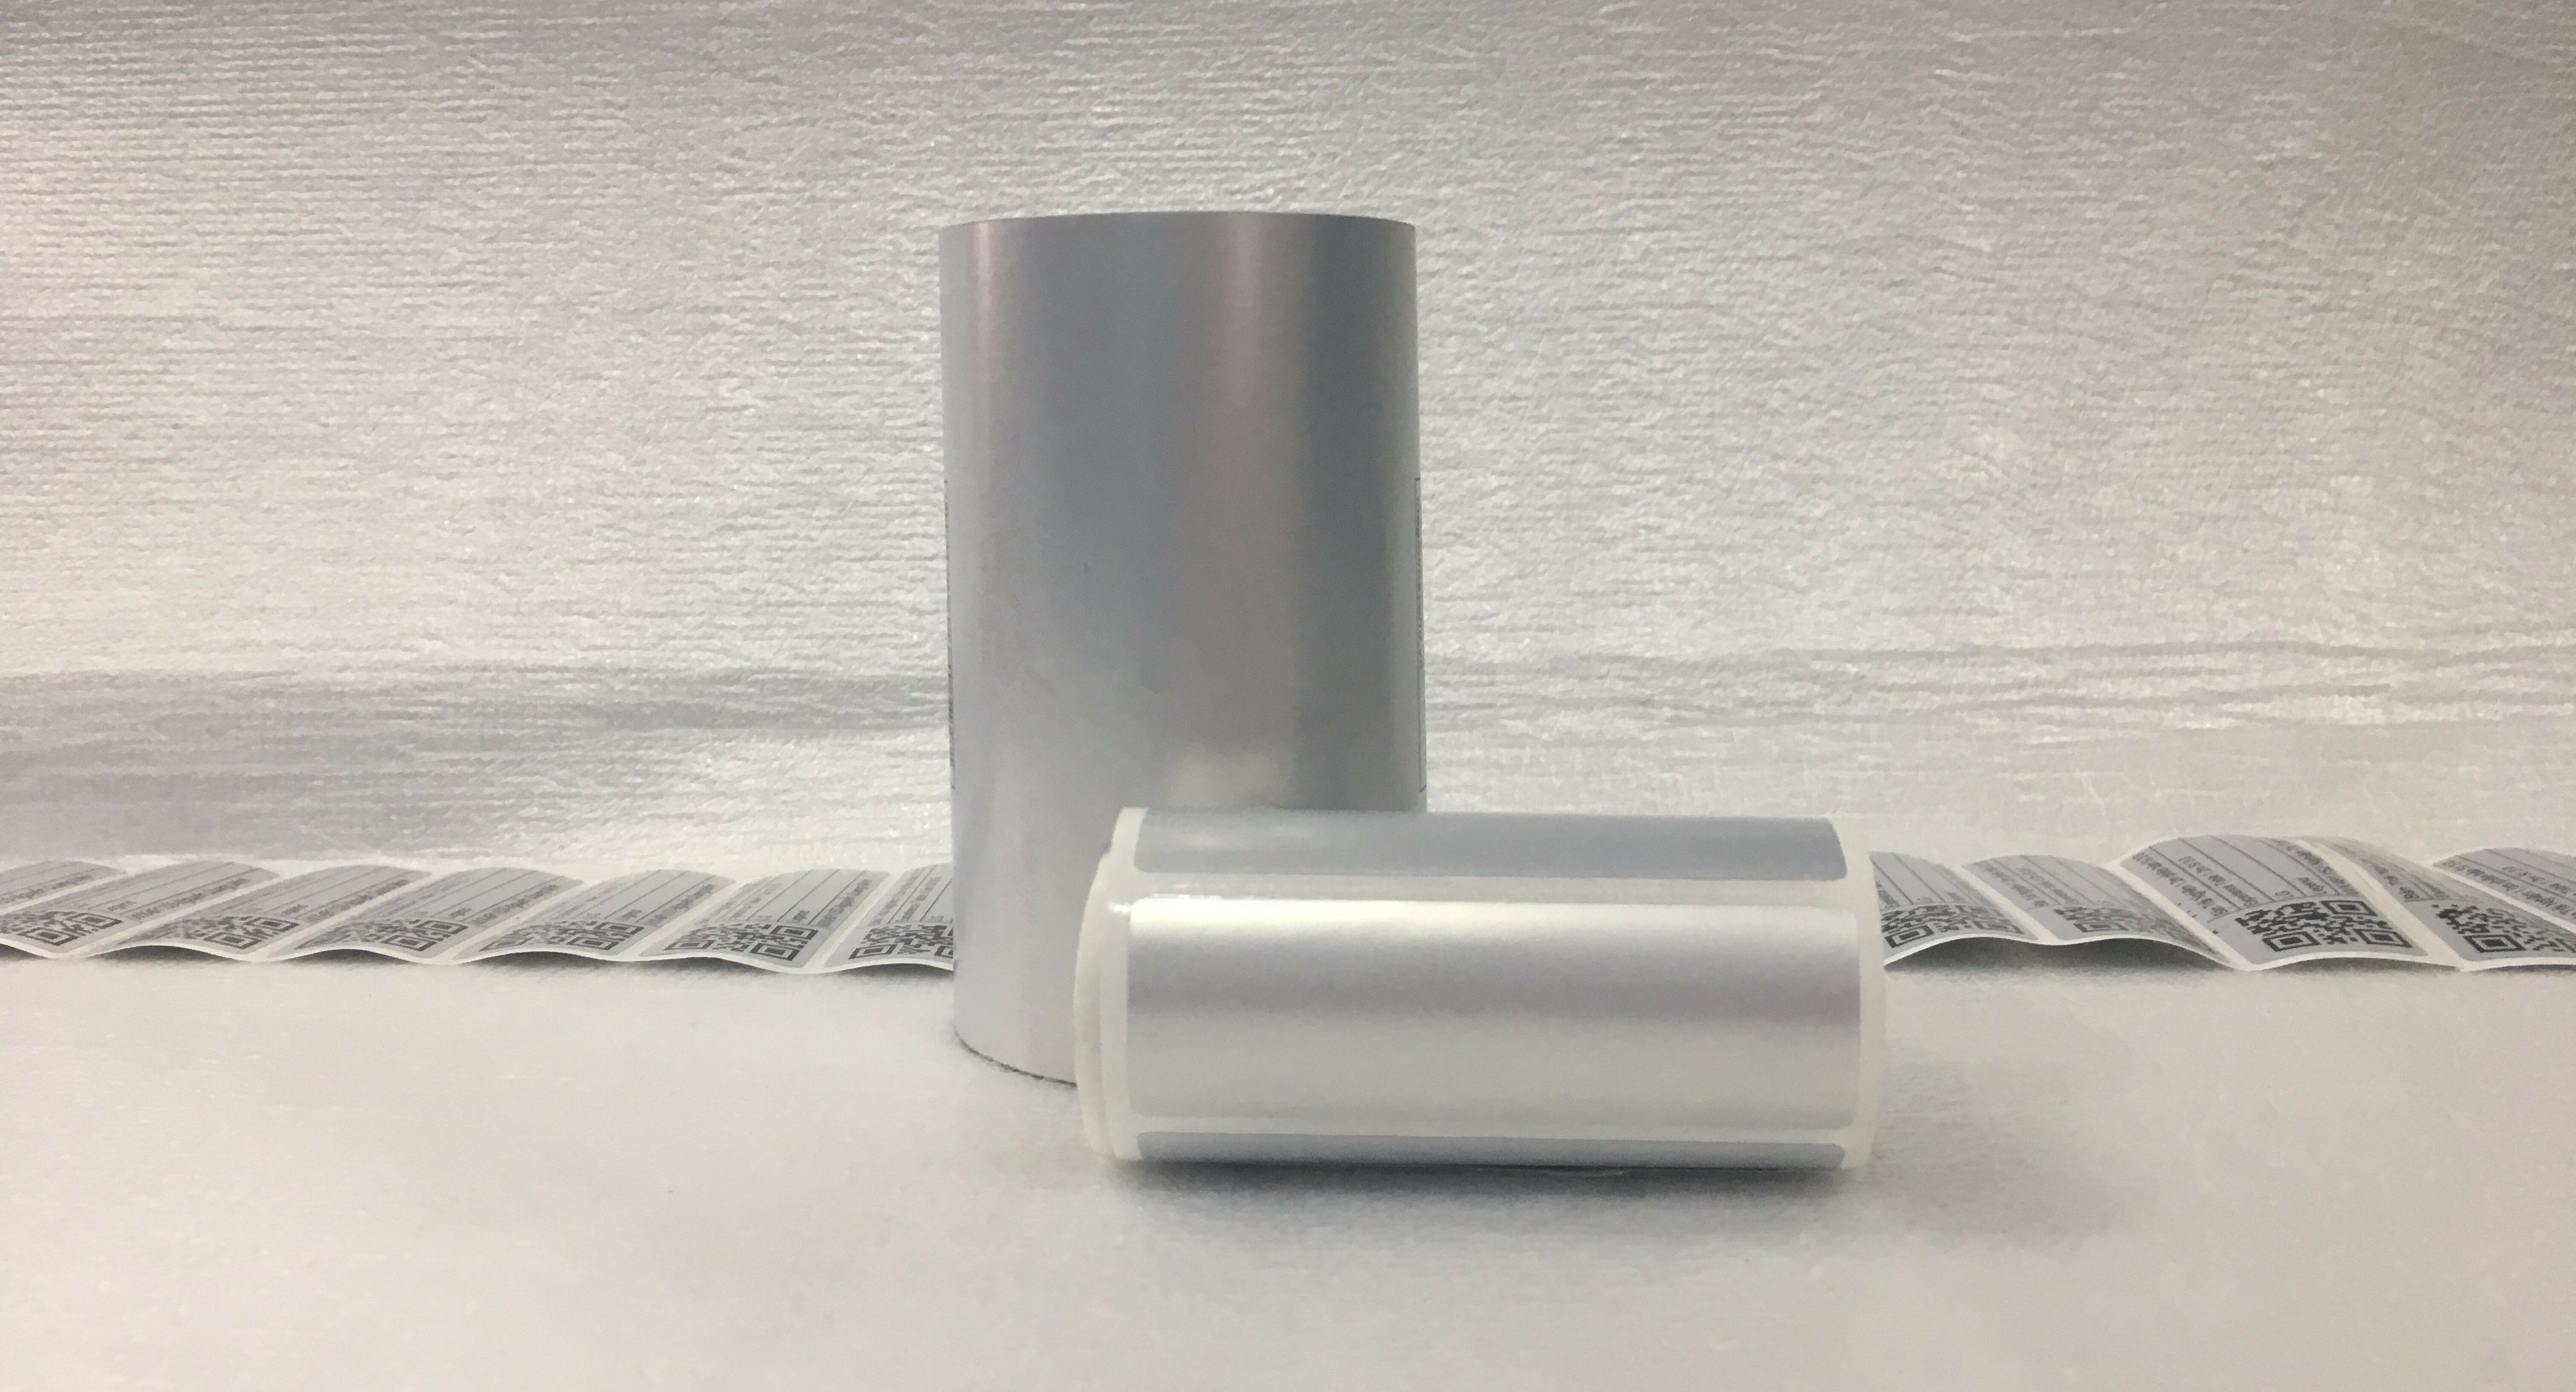 Decal xi kim loại (decal nhôm, decal xi bạc)